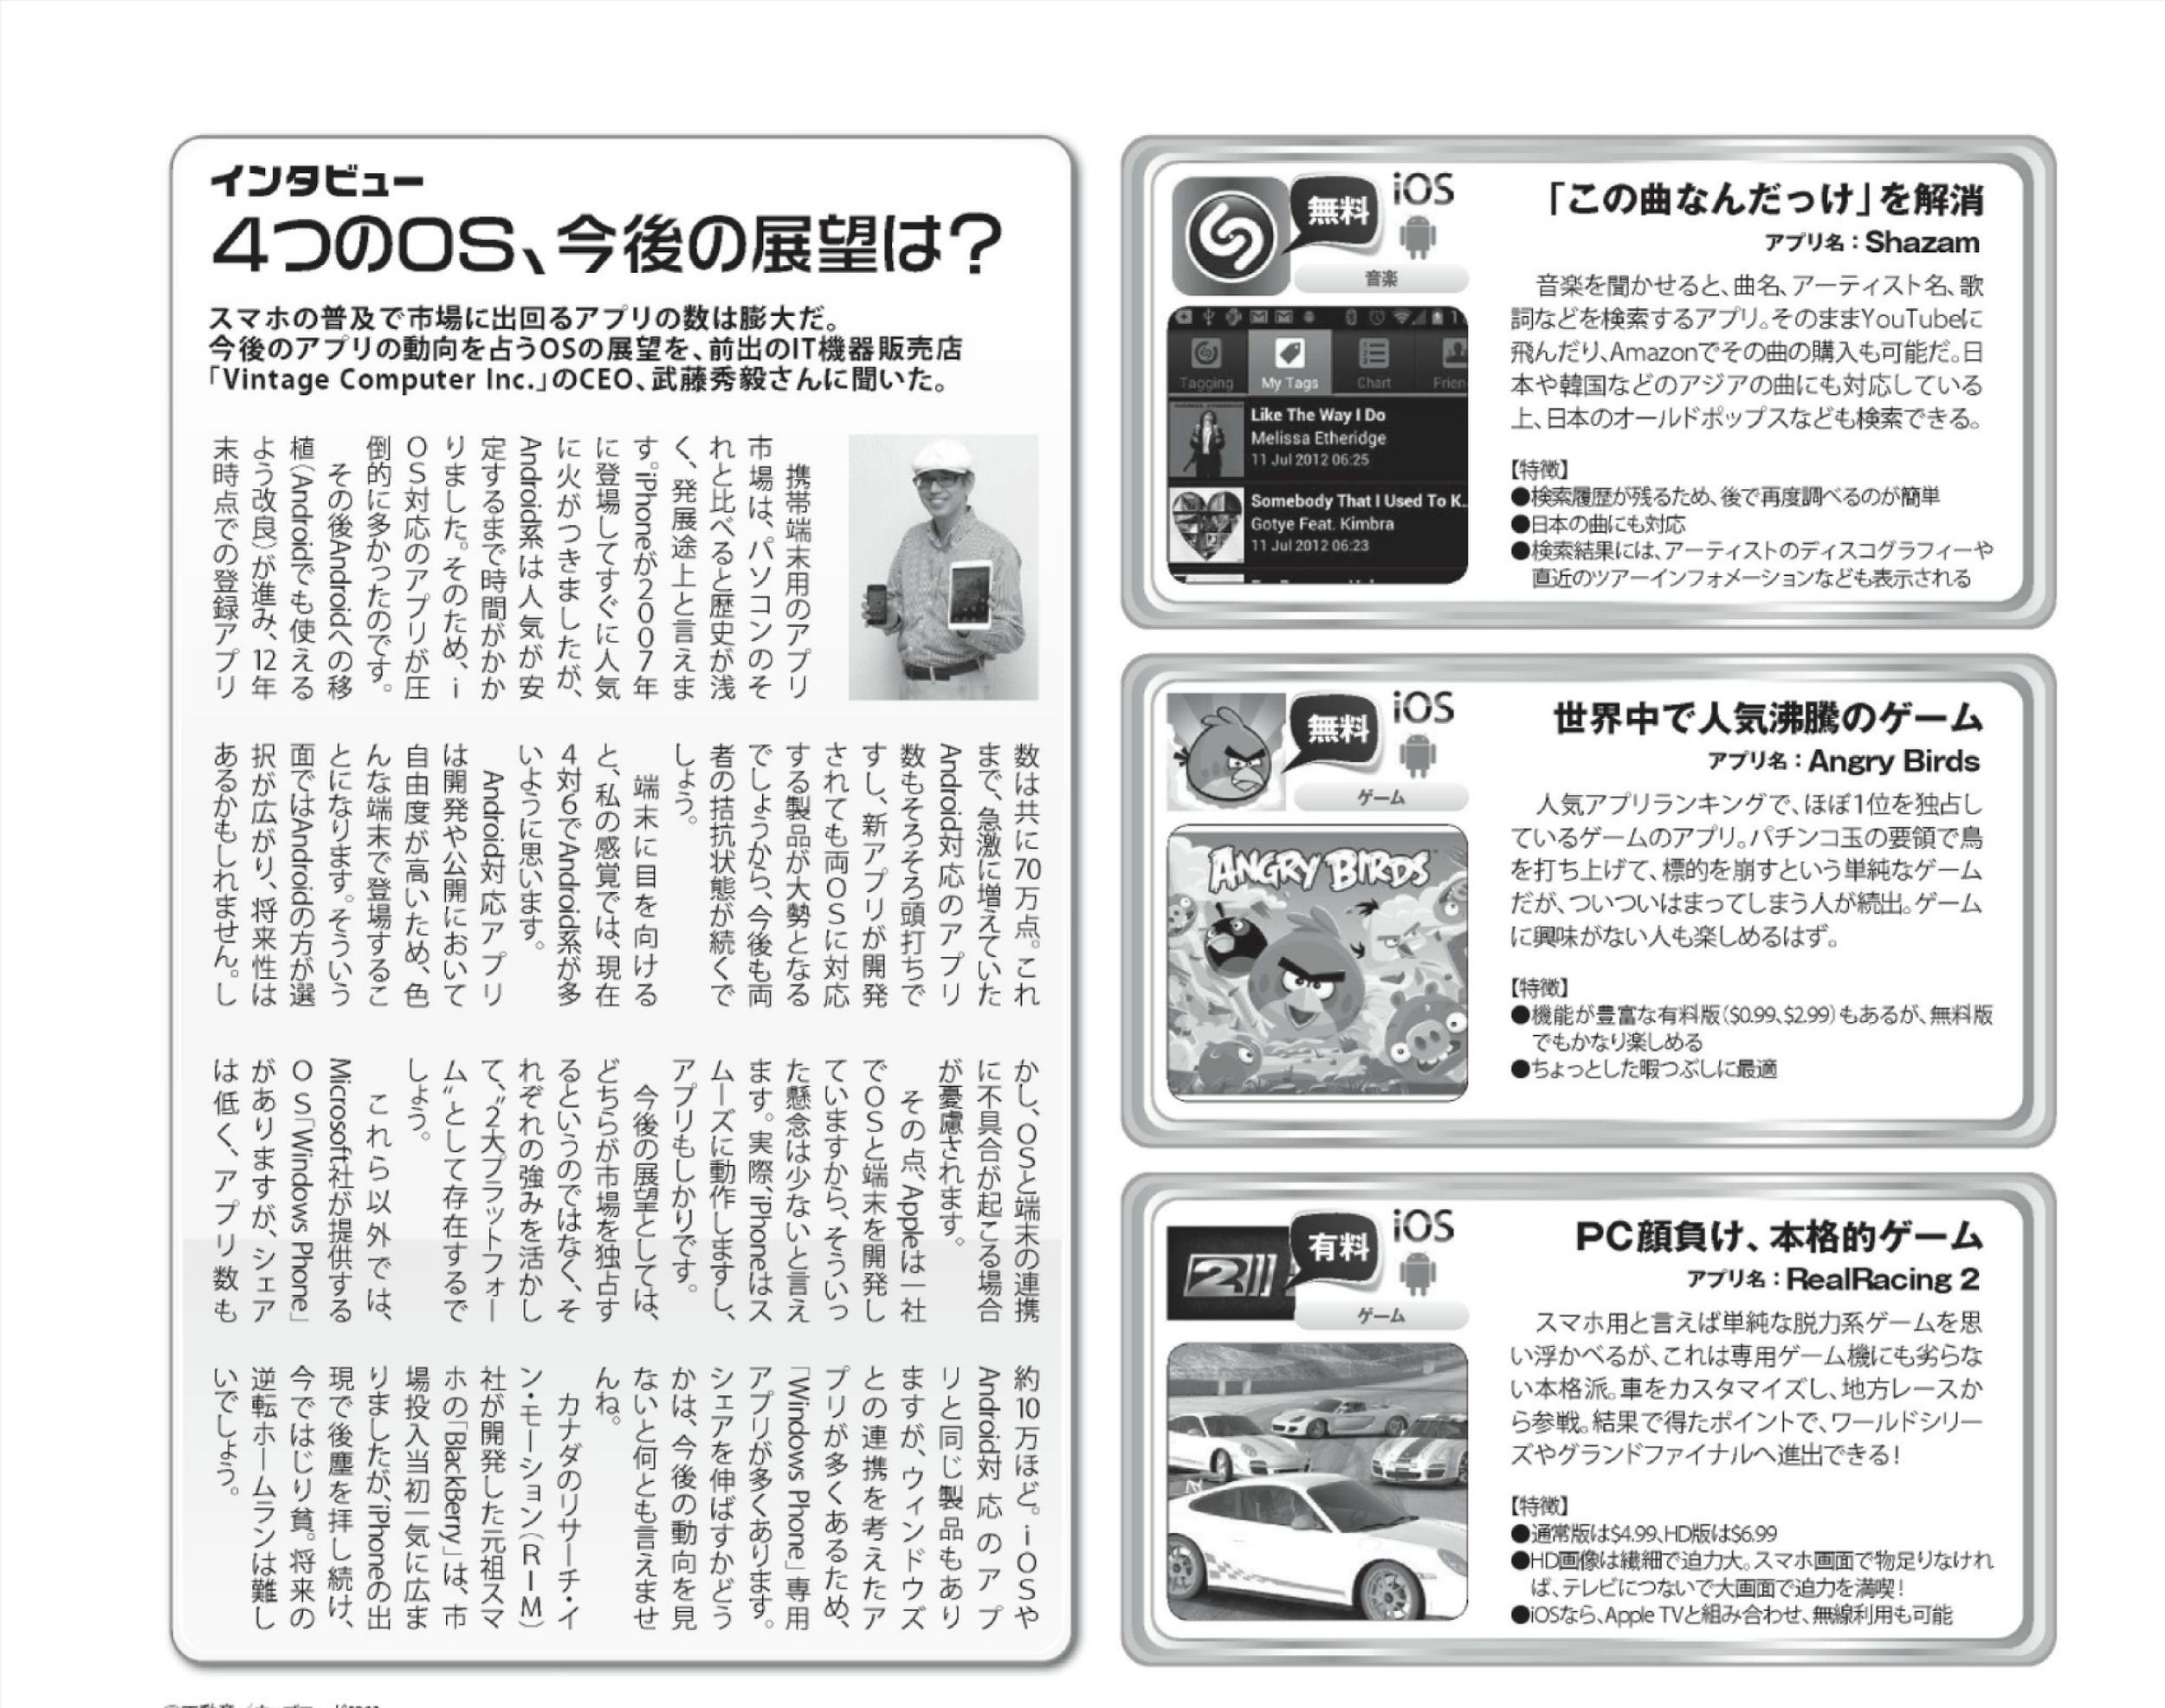 Lighthouse LA January 16, 2013 Page1-5.jpg